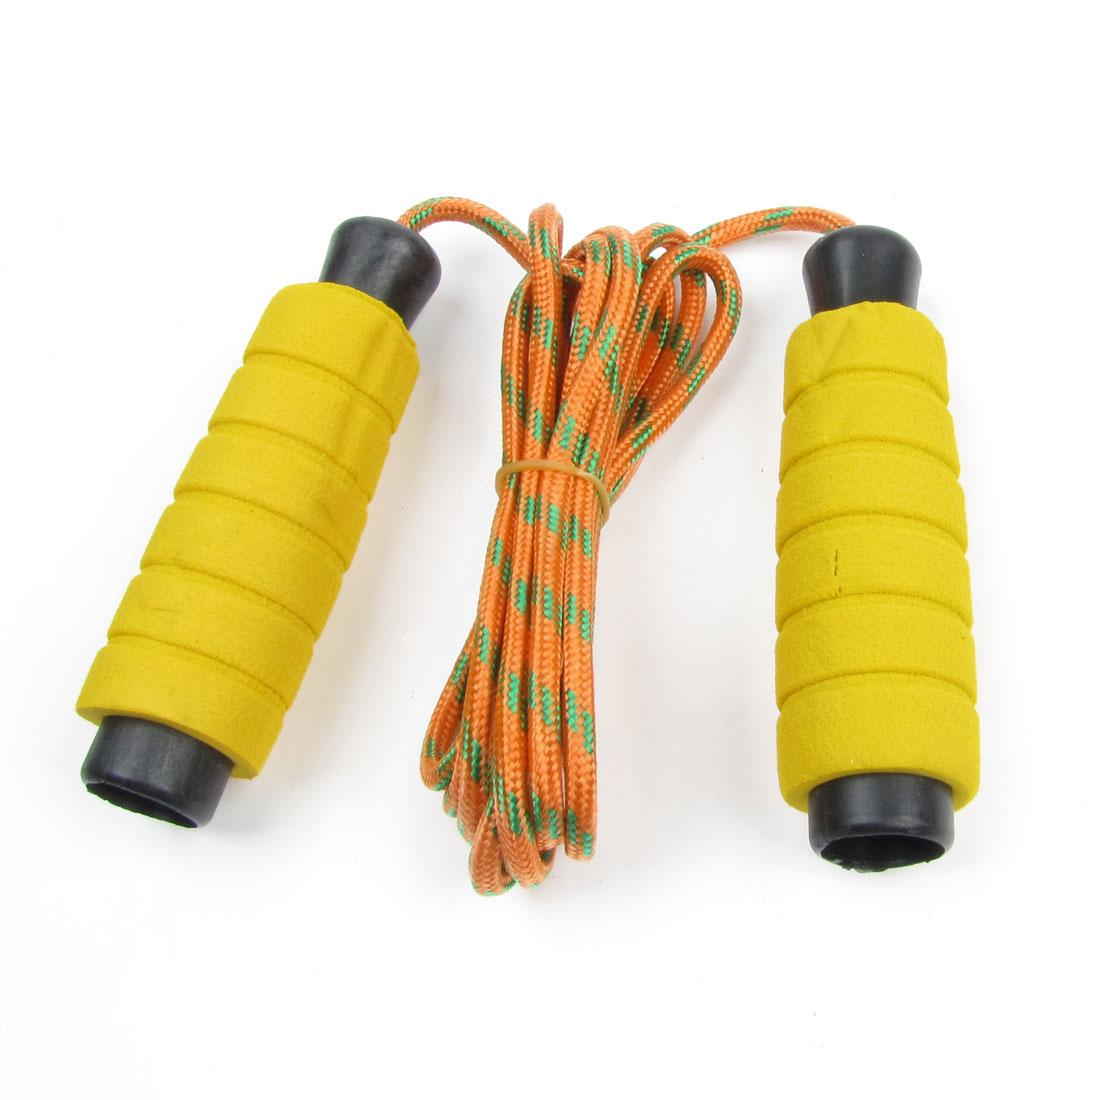 Sports Yellow Handle Orange Braided Nylon Cord Skipping Jumping Skip Rope 7.2Ft